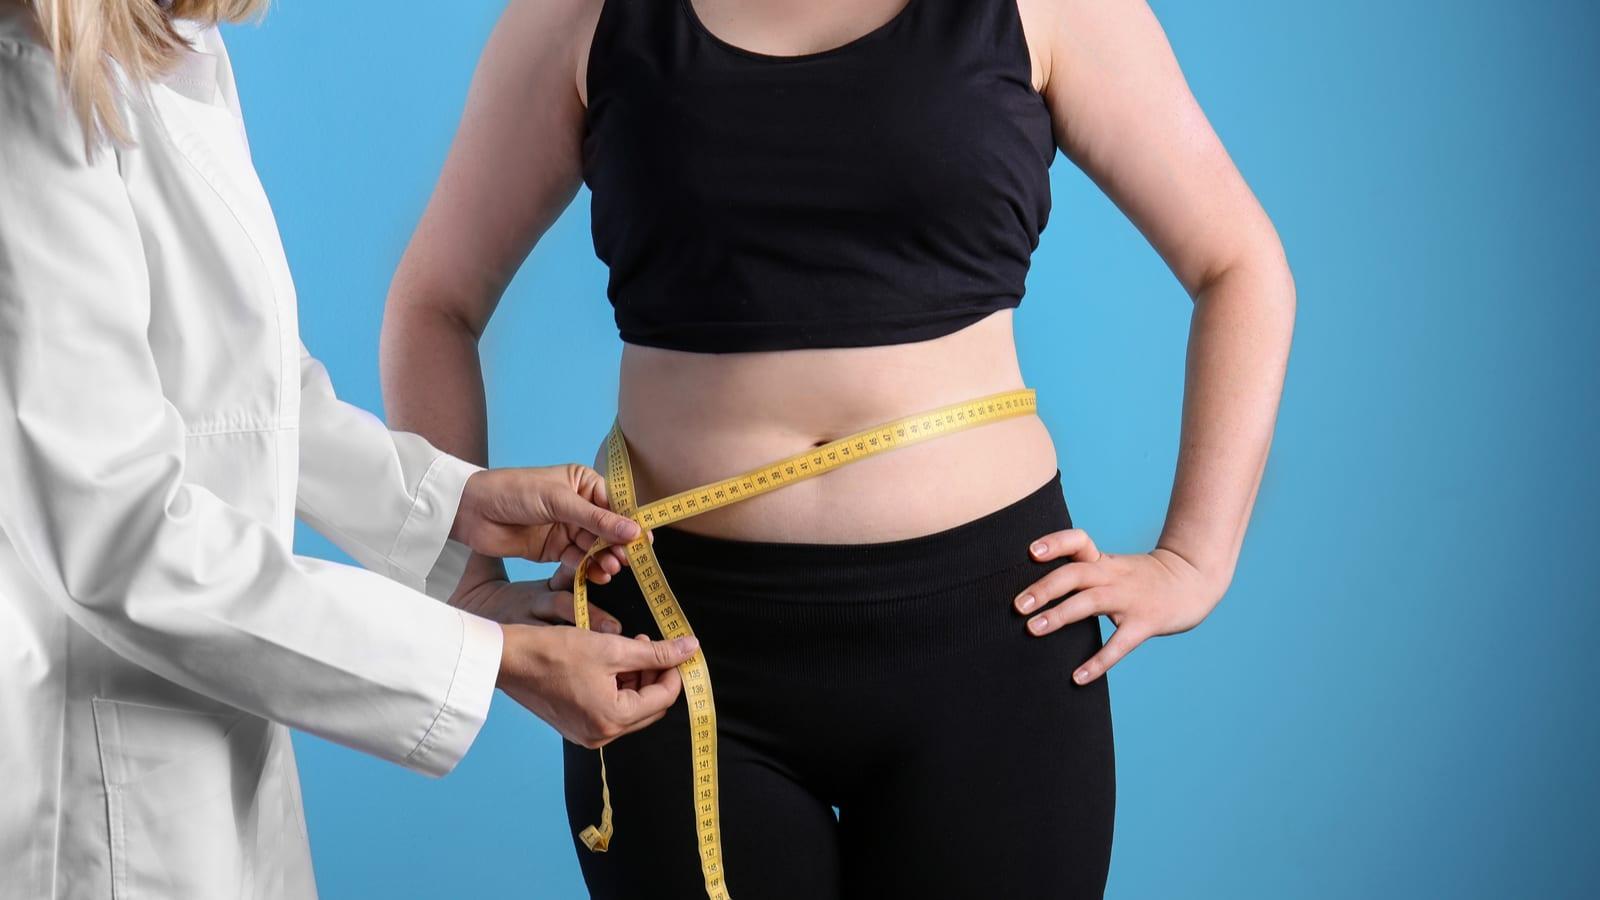 Doctor taking woman's waist measurement